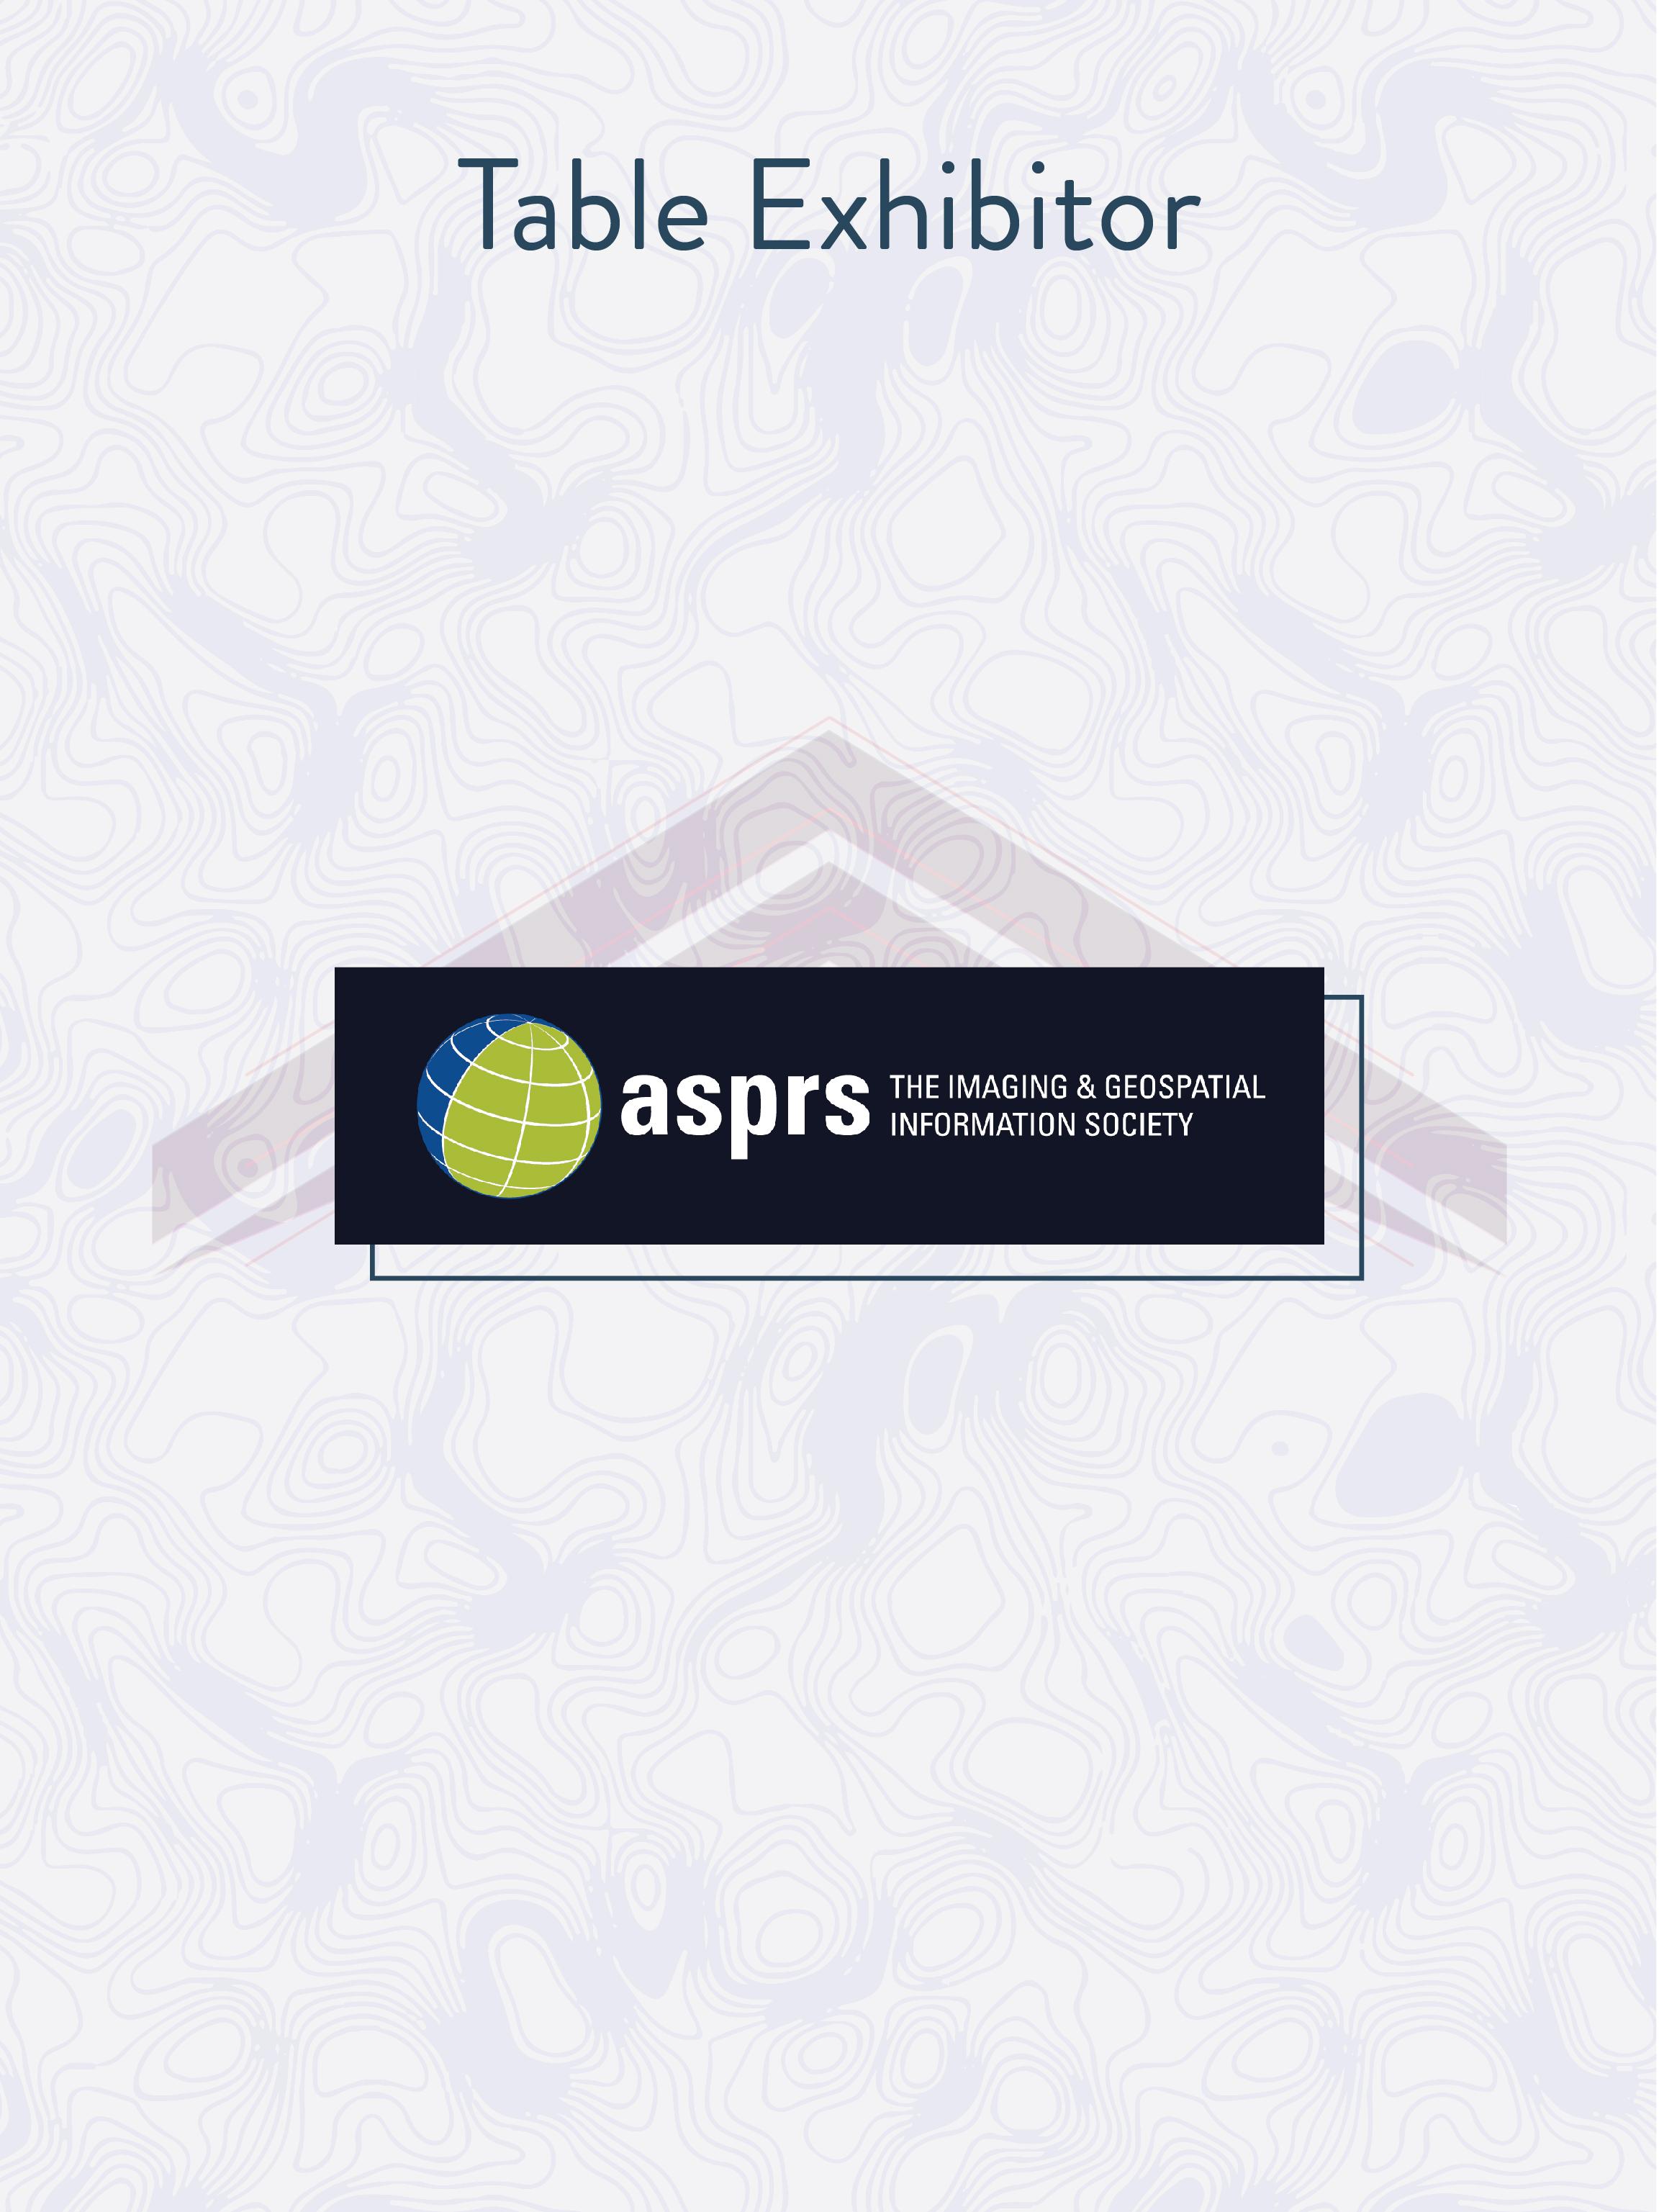 ASPRS.jpg